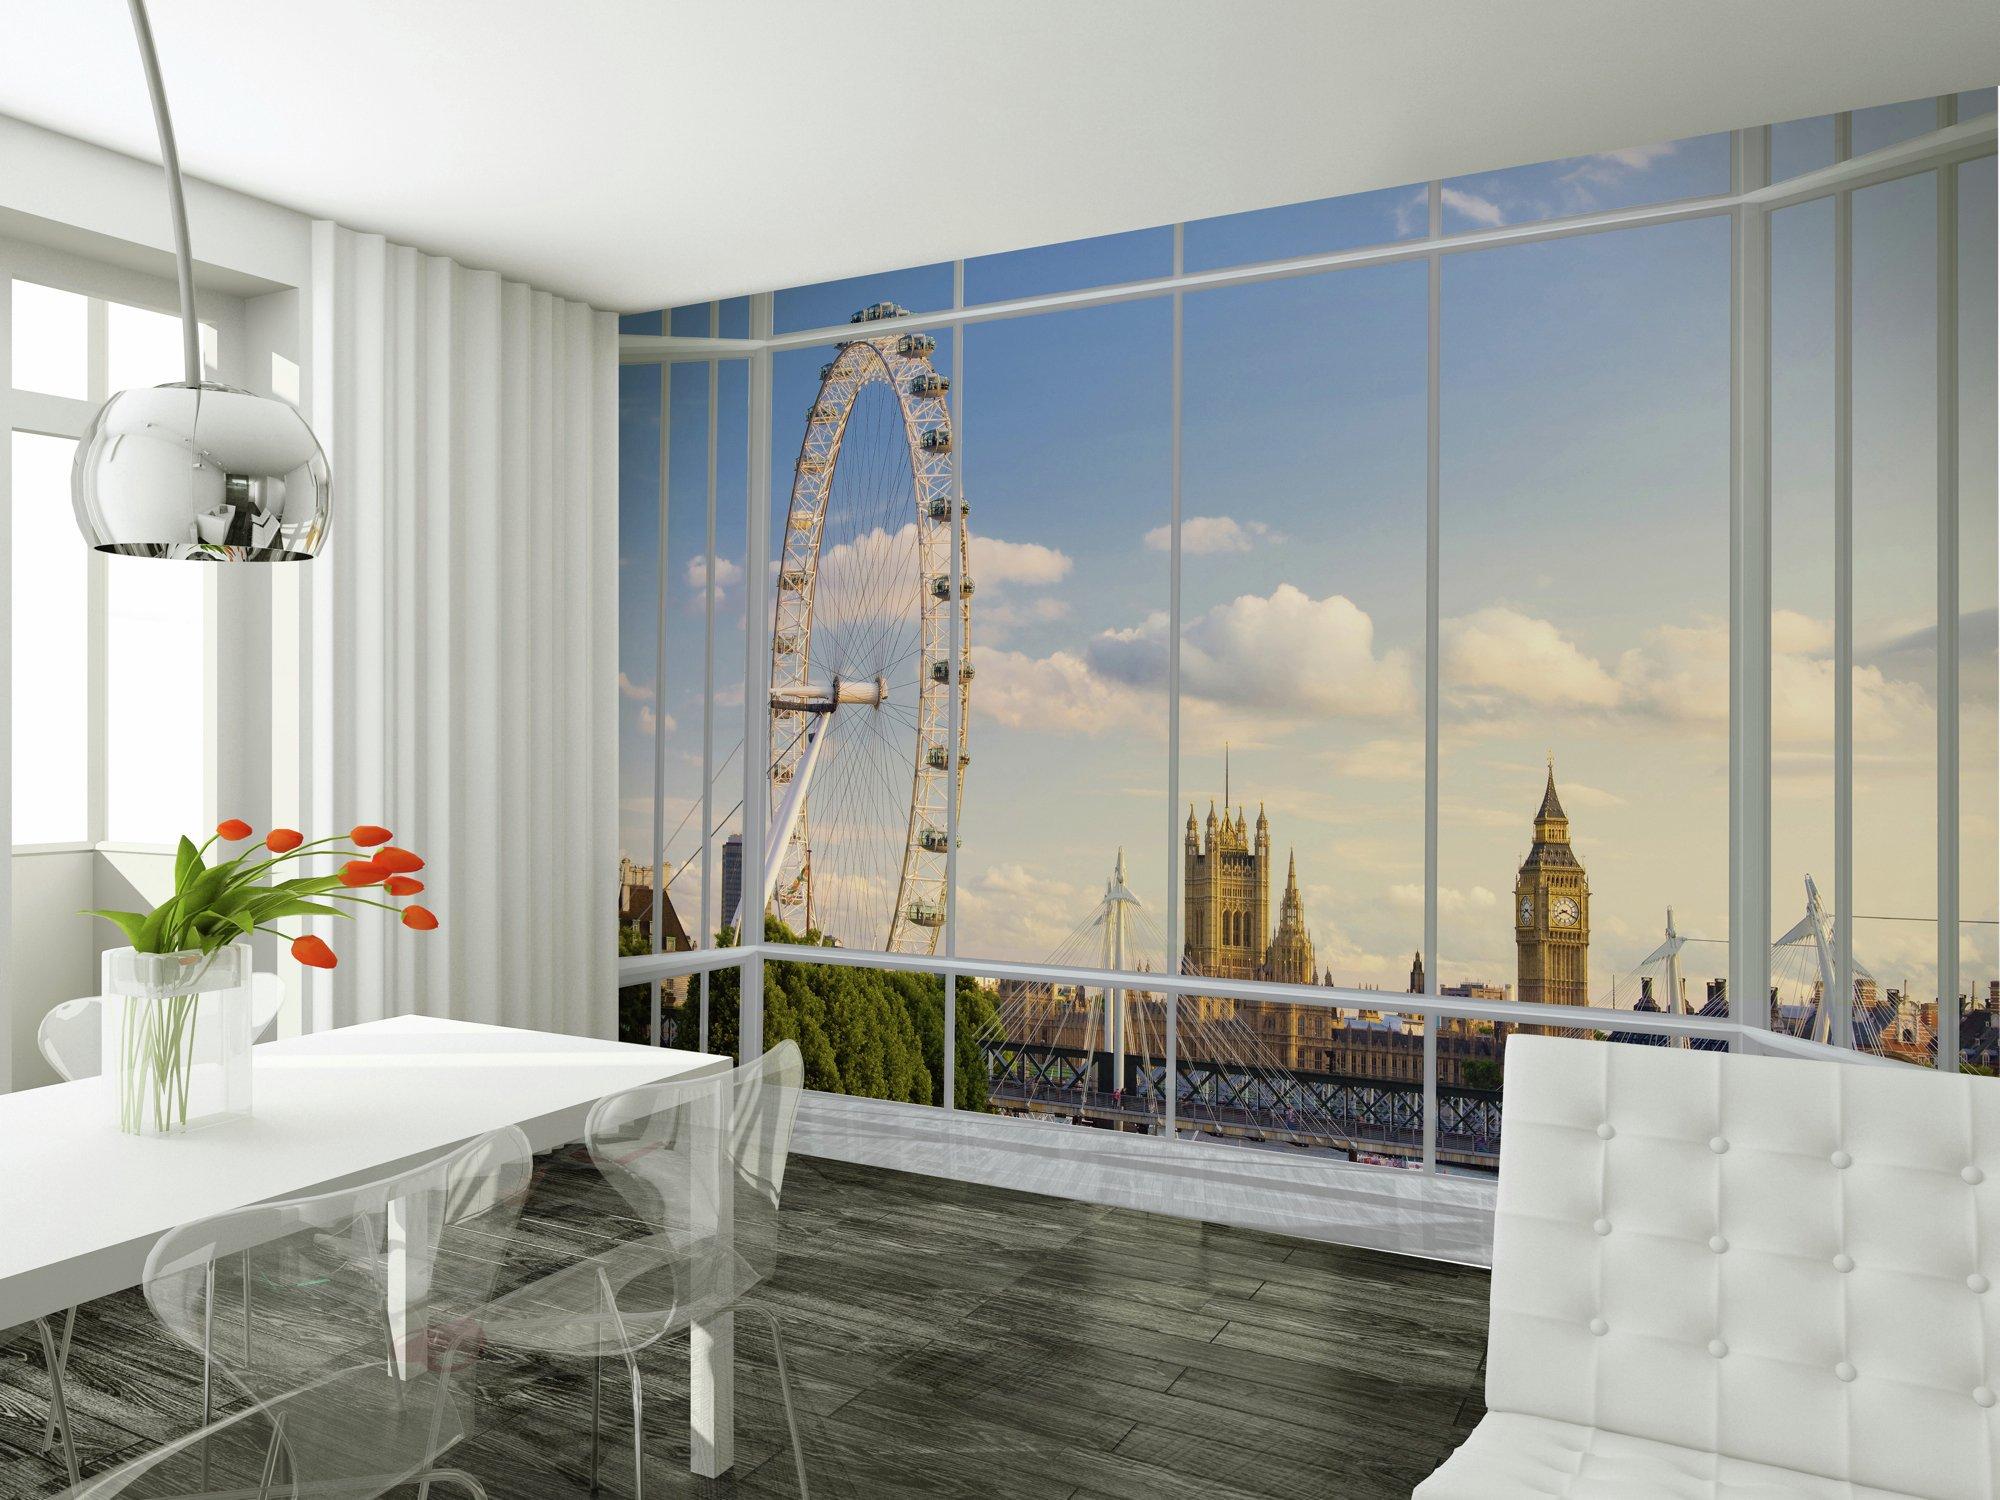 1Wall - London Window Giant Mural